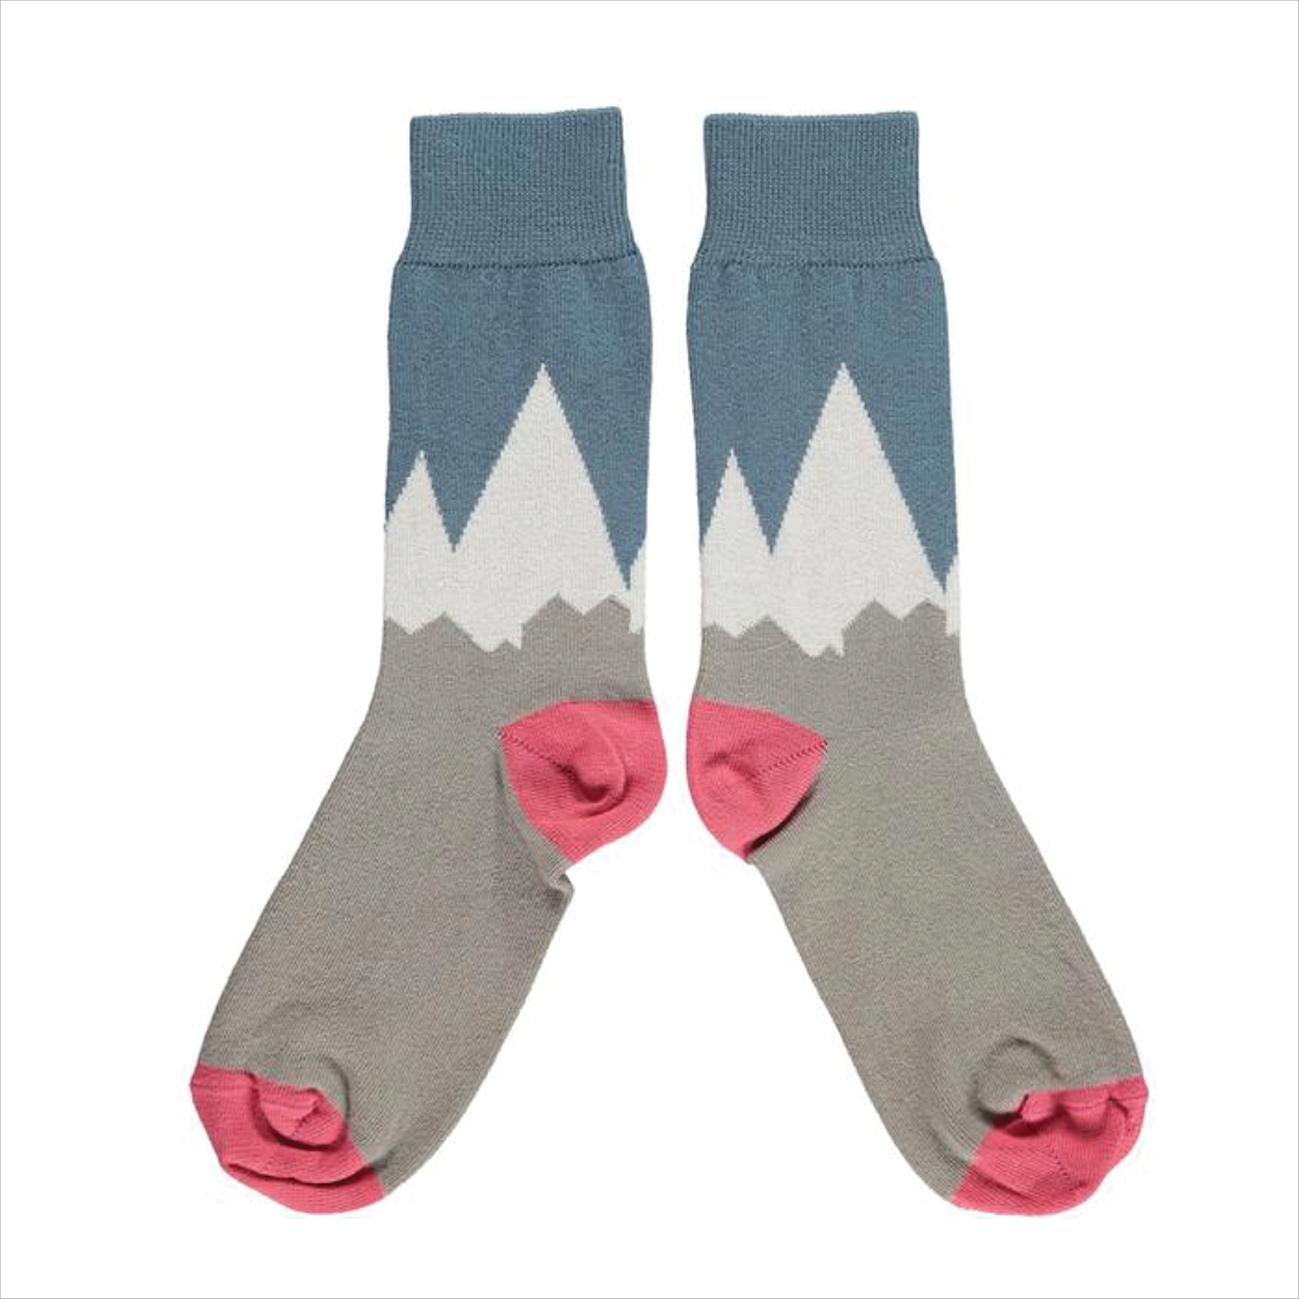 catherine tough - women's cotton socks